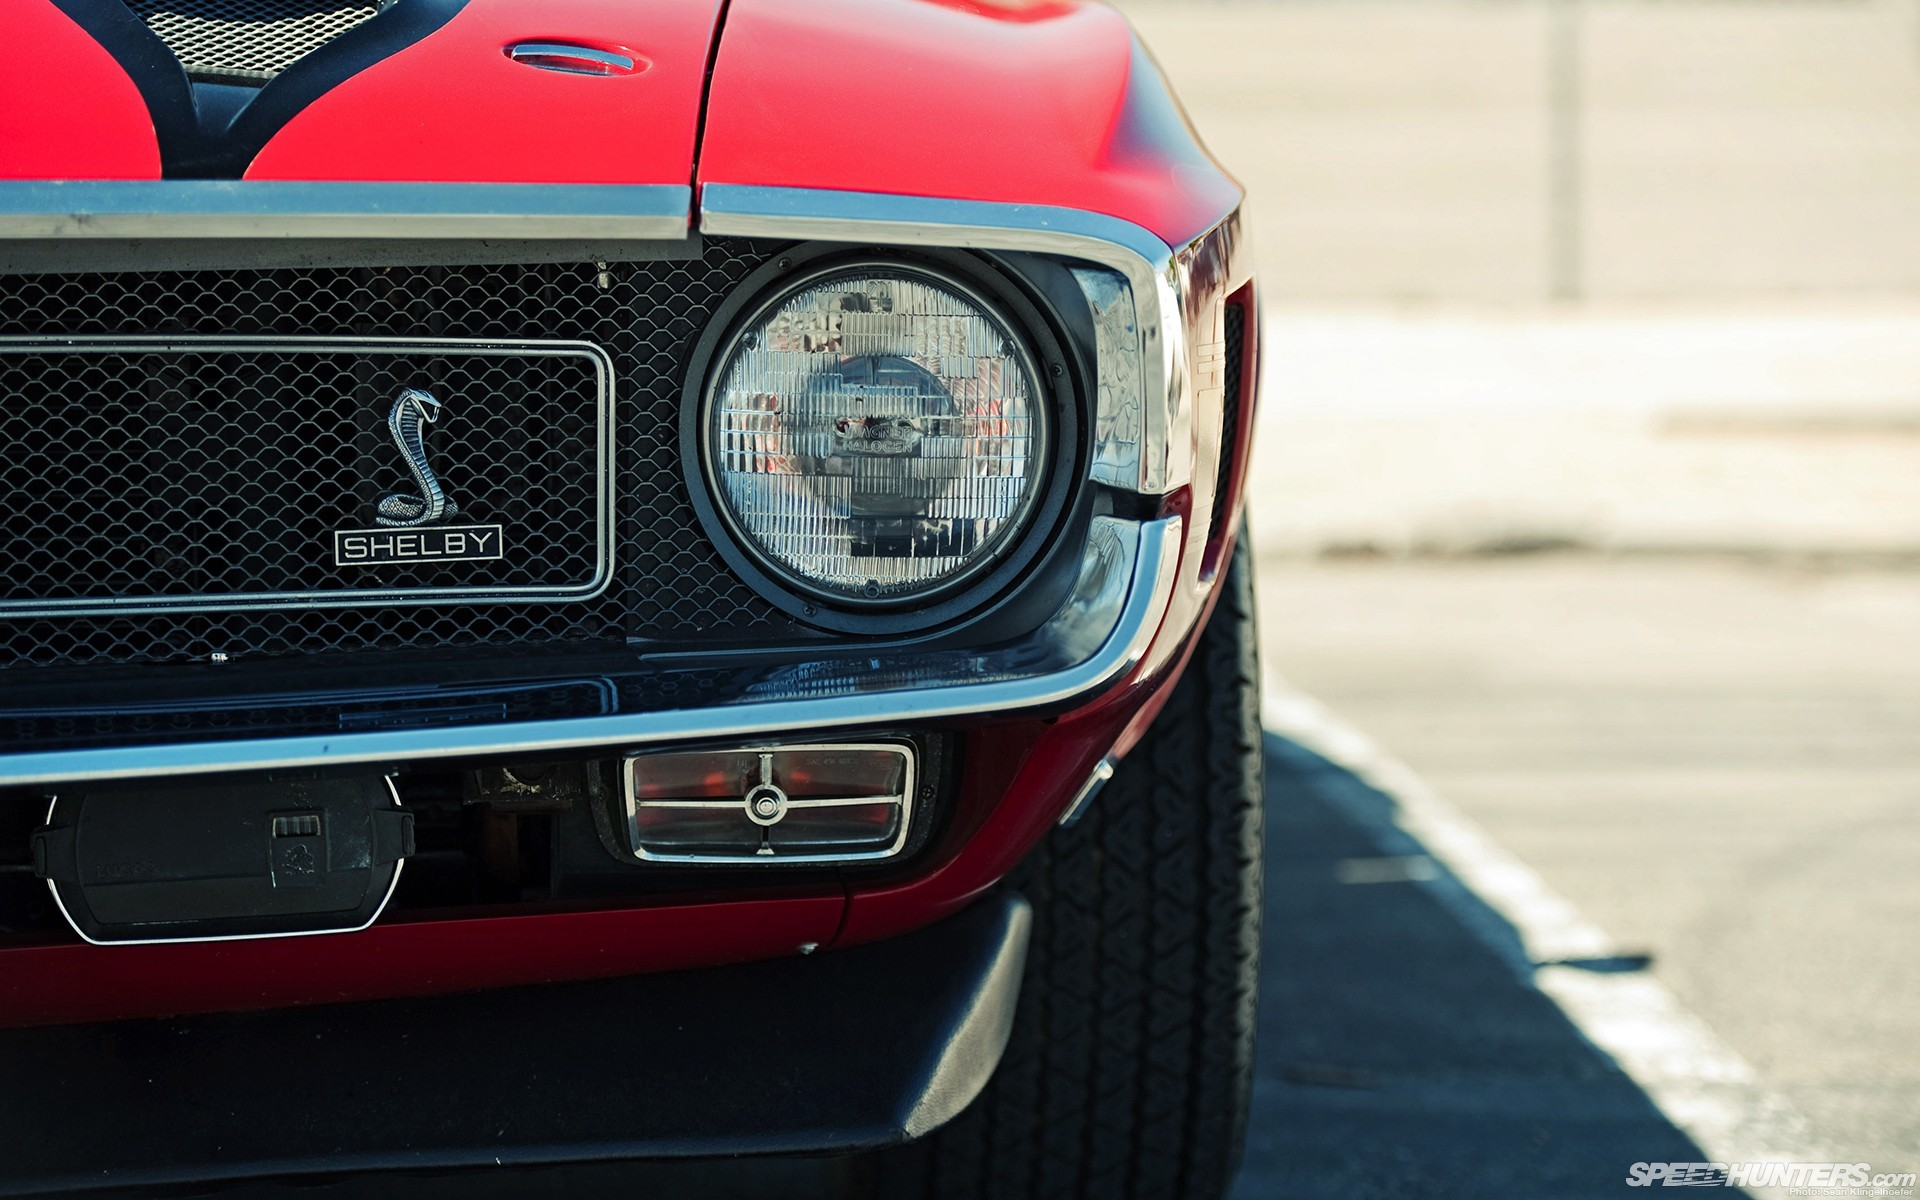 Cars Shelby Cobra SpeedHunters_com headlights wallpaper .